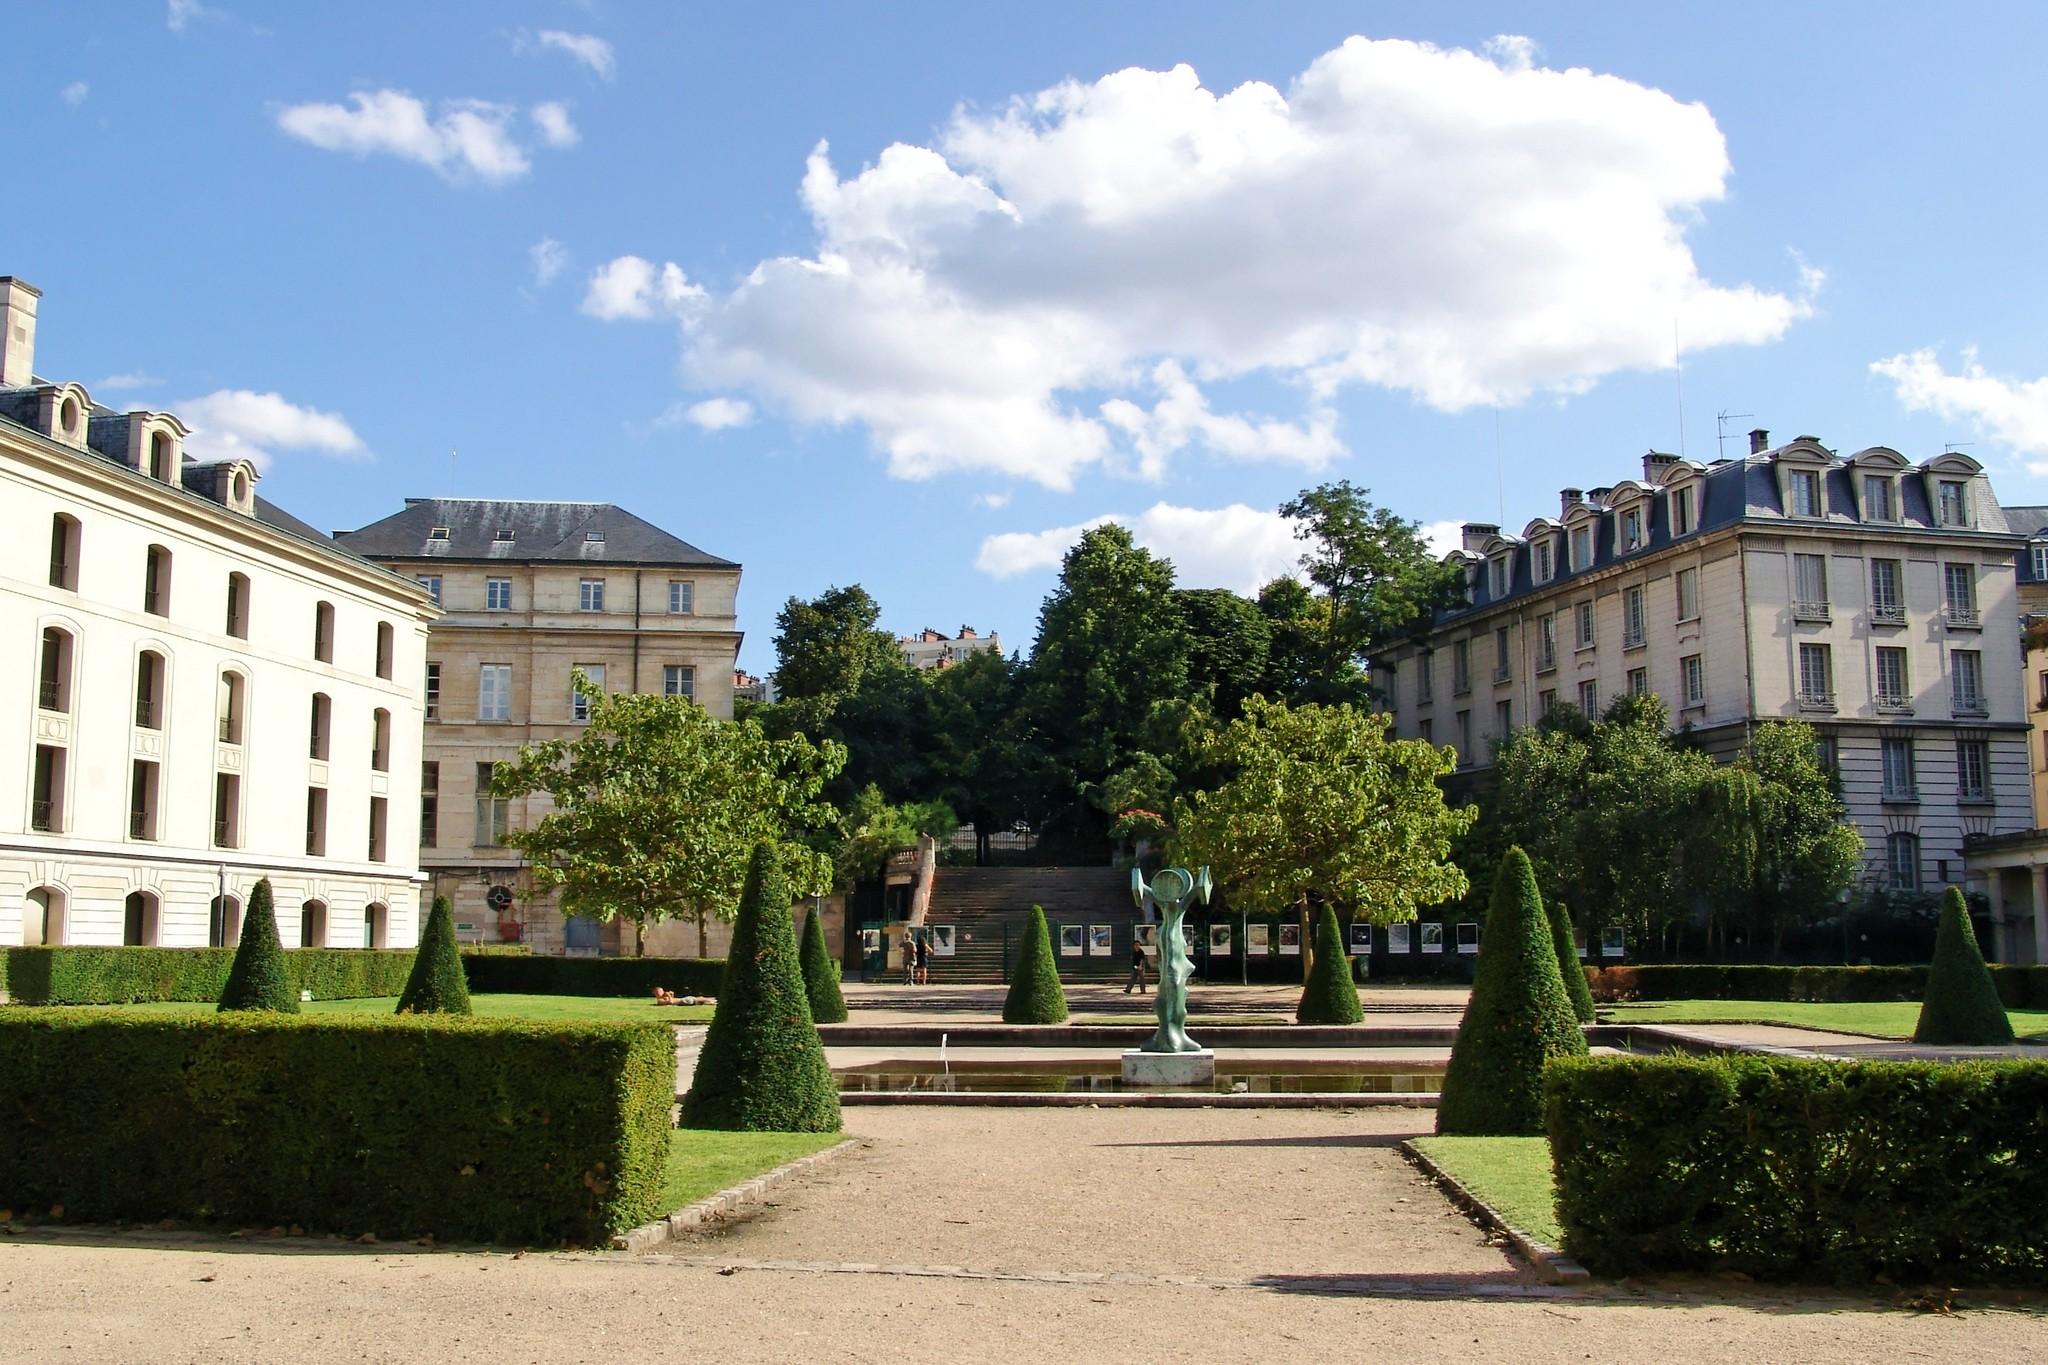 Historic garden at Ecole Polytechnique